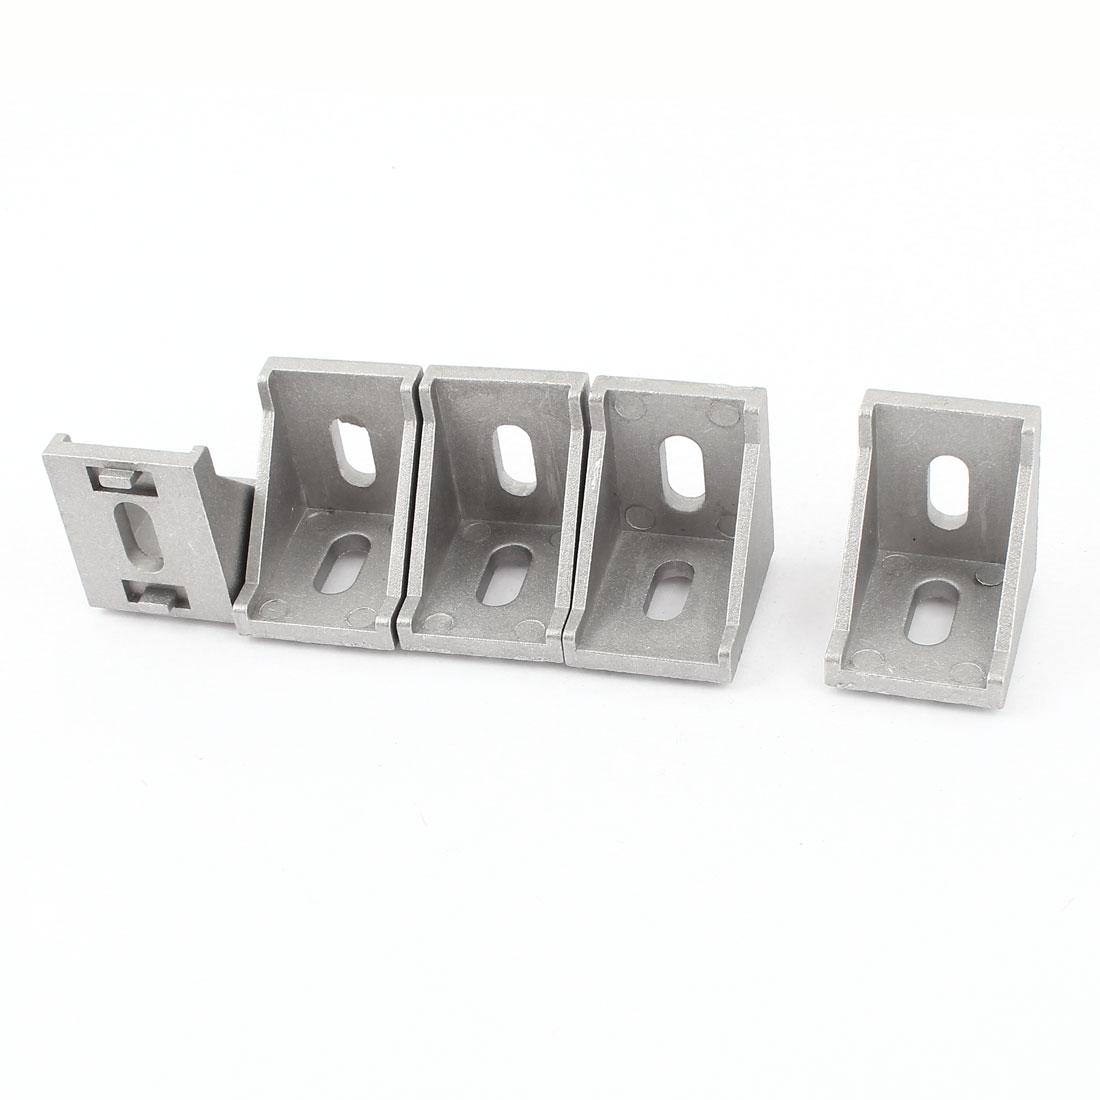 5 Pcs Silver Tone Metal 90 Degree Door Angle Bracket 34mm x 34mm